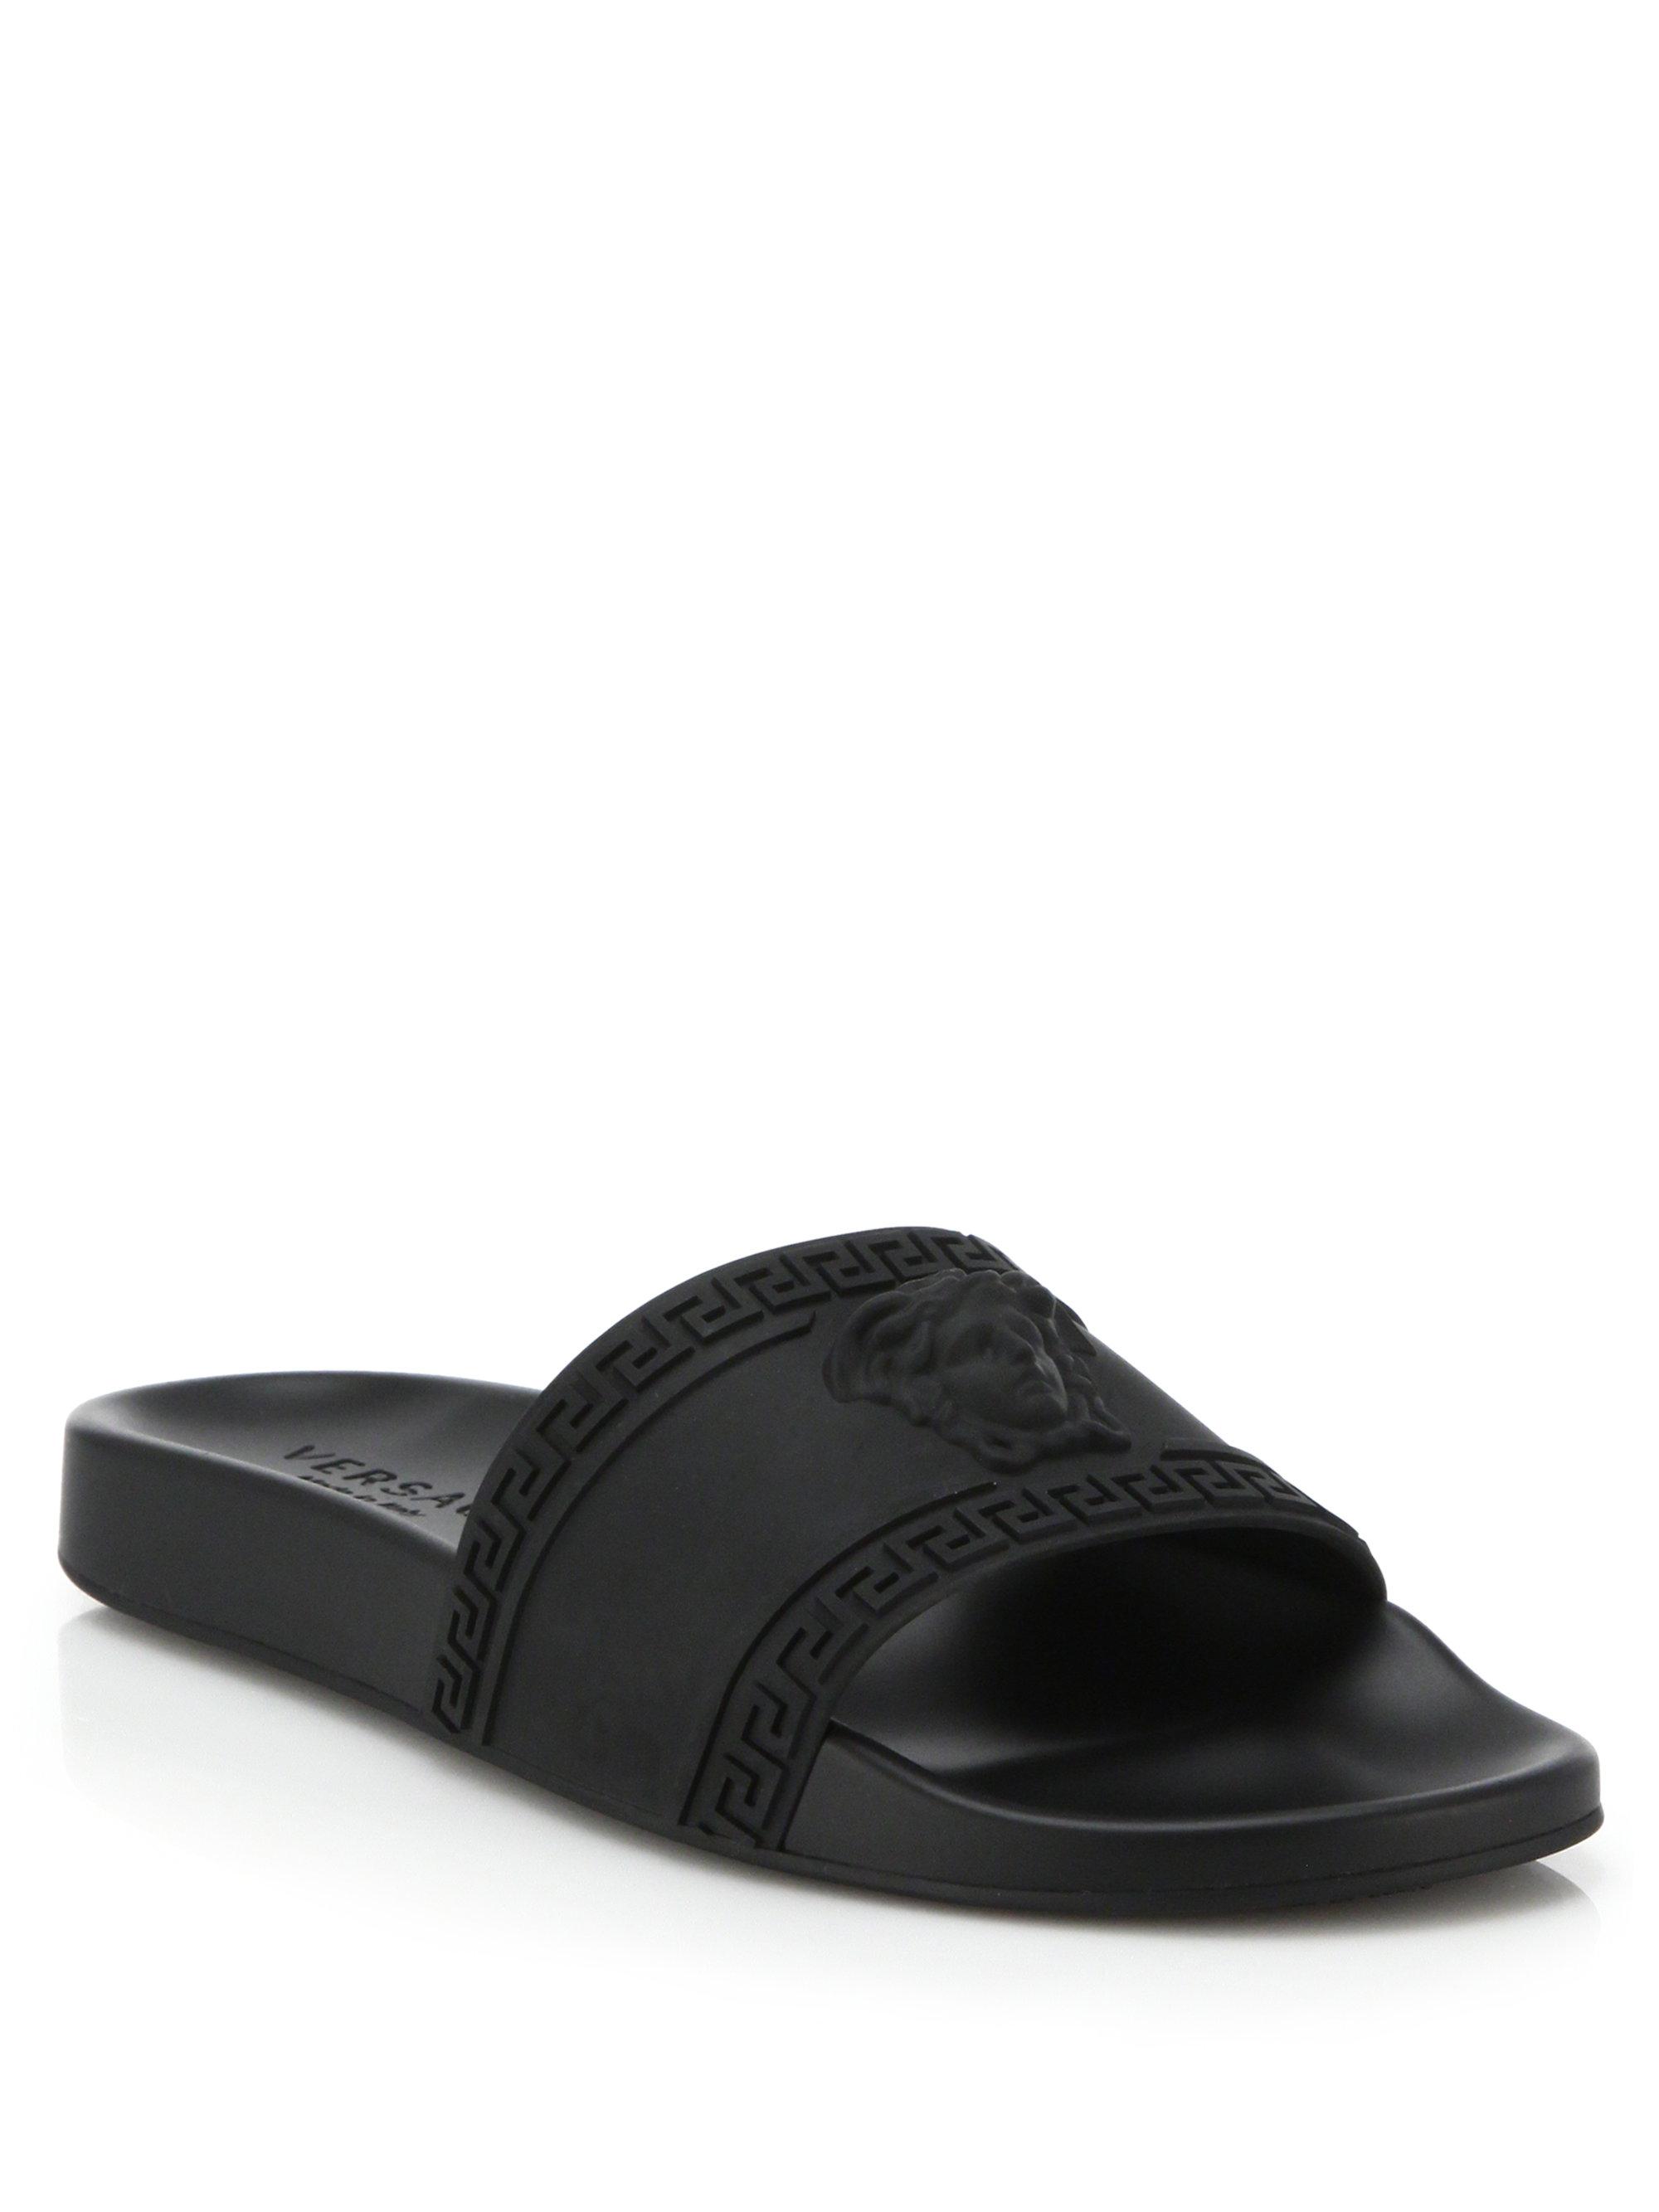 Versace Medusa Cardinal Slide Sandals in Black for Men | Lyst